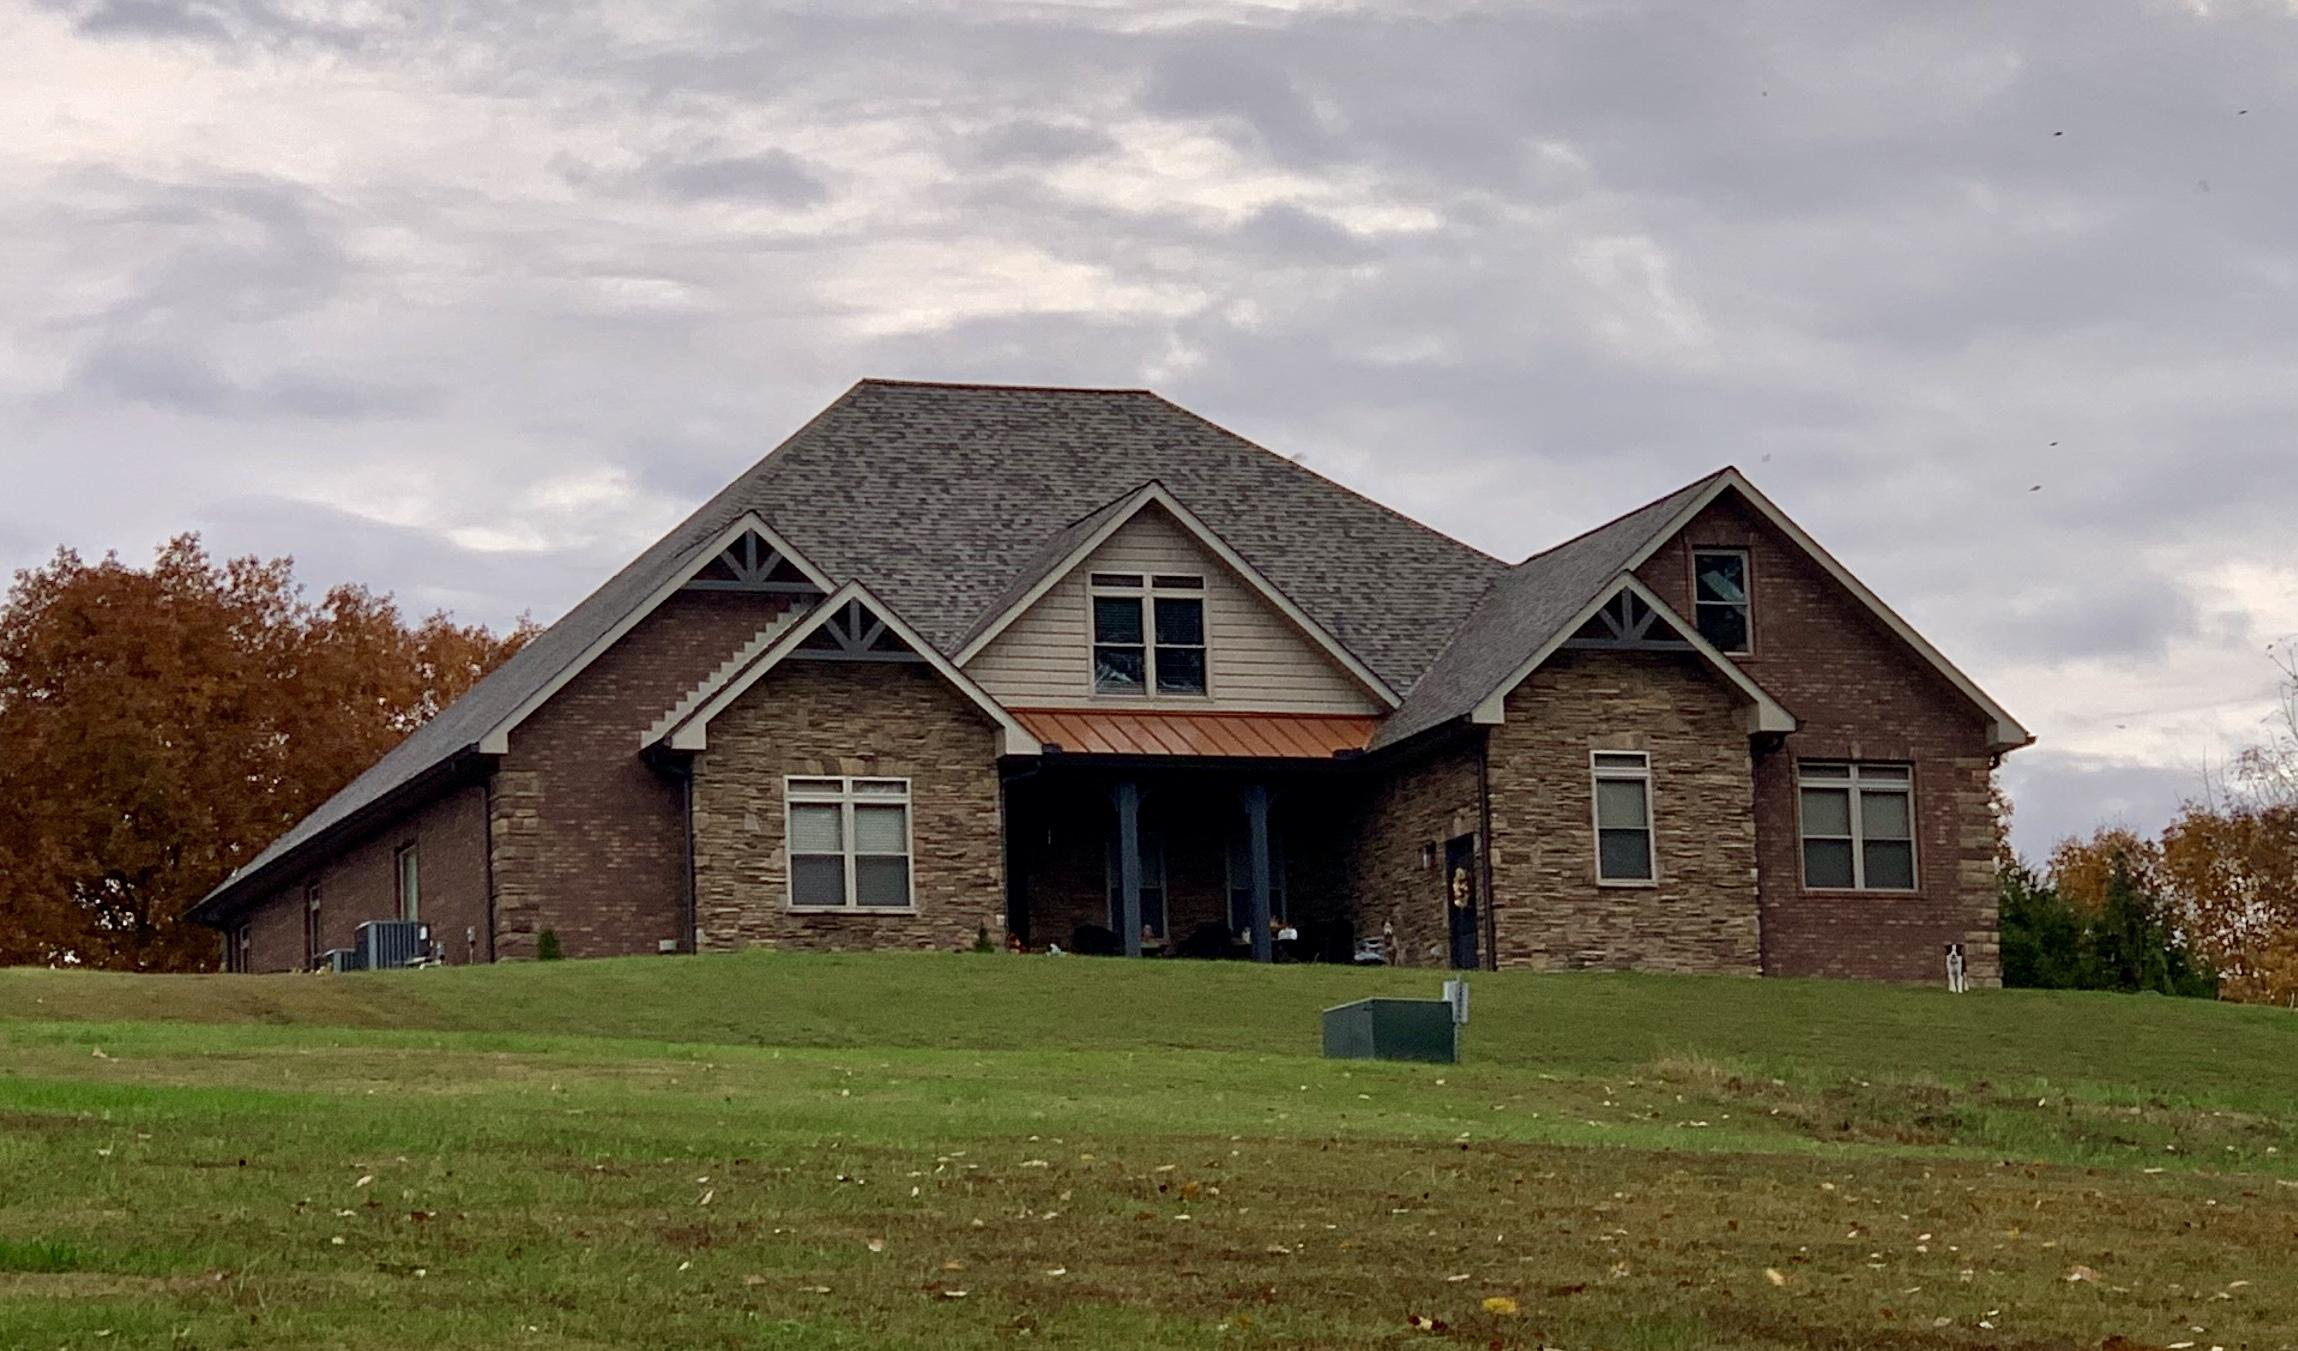 230 Cinnabar Drive, New Tazewell, Tennessee 37825, 4 Bedrooms Bedrooms, ,5 BathroomsBathrooms,Single Family,For Sale,Cinnabar,1097830